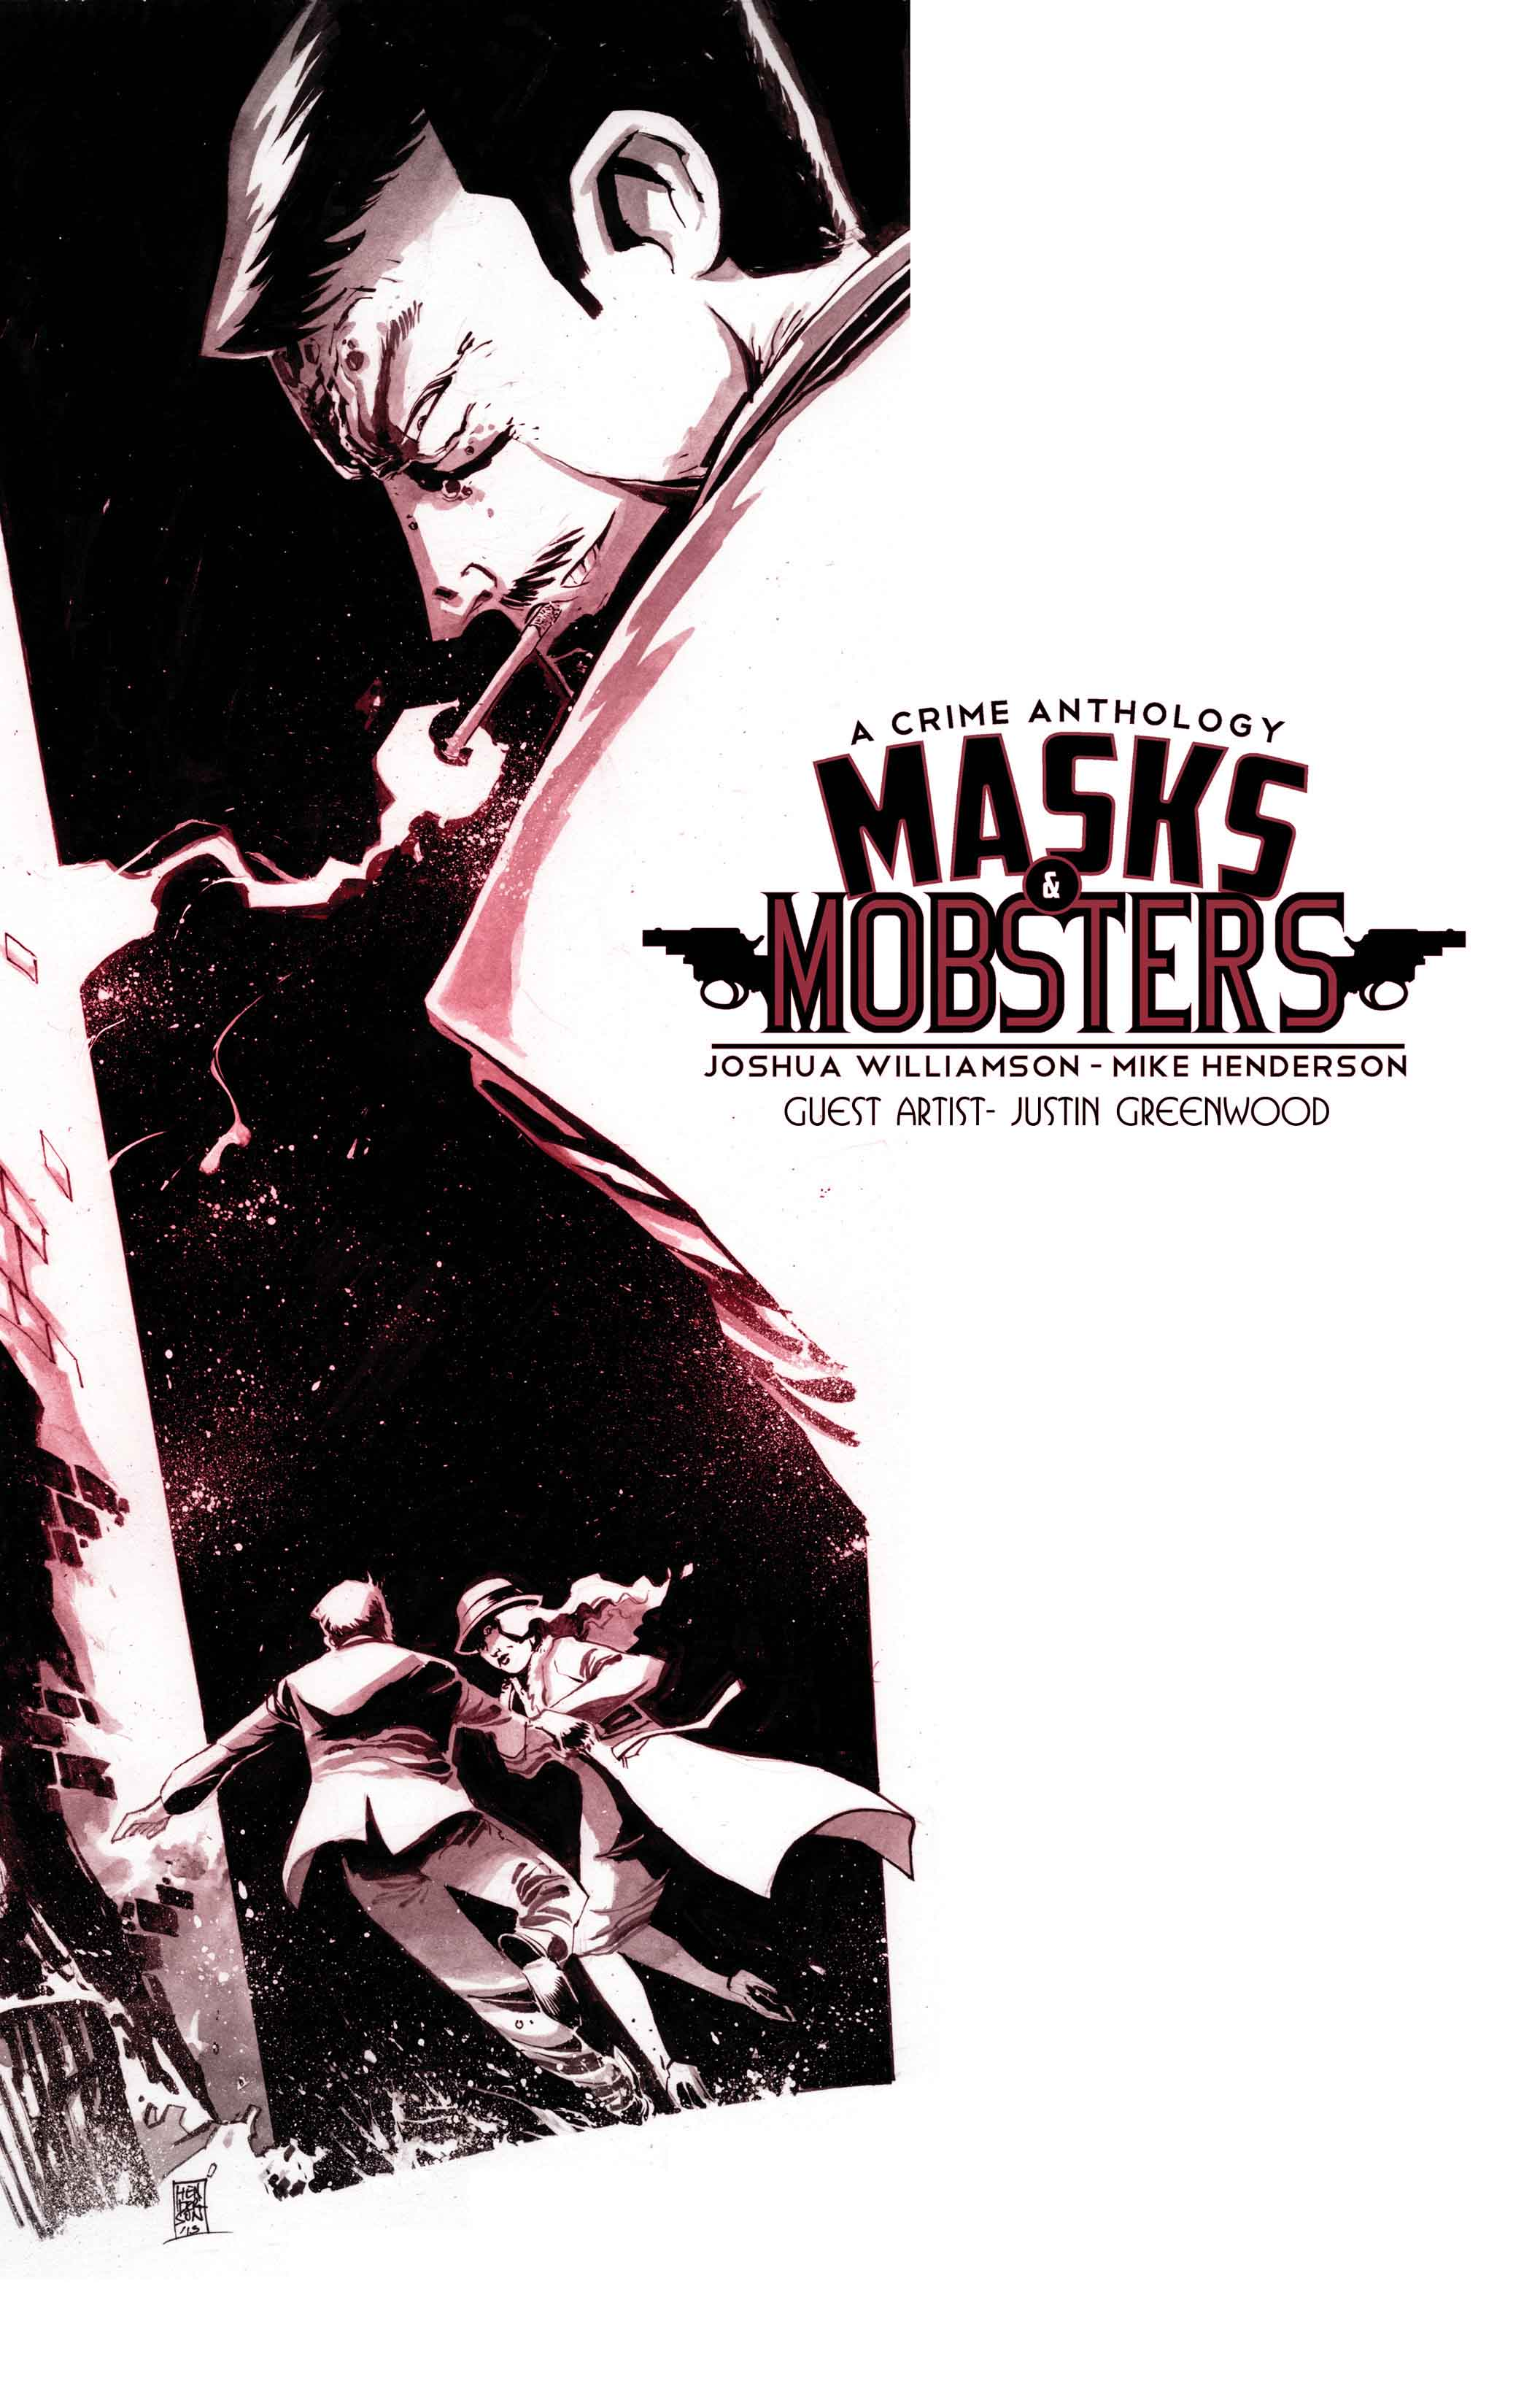 Masks_and_Mobsters_06.indd